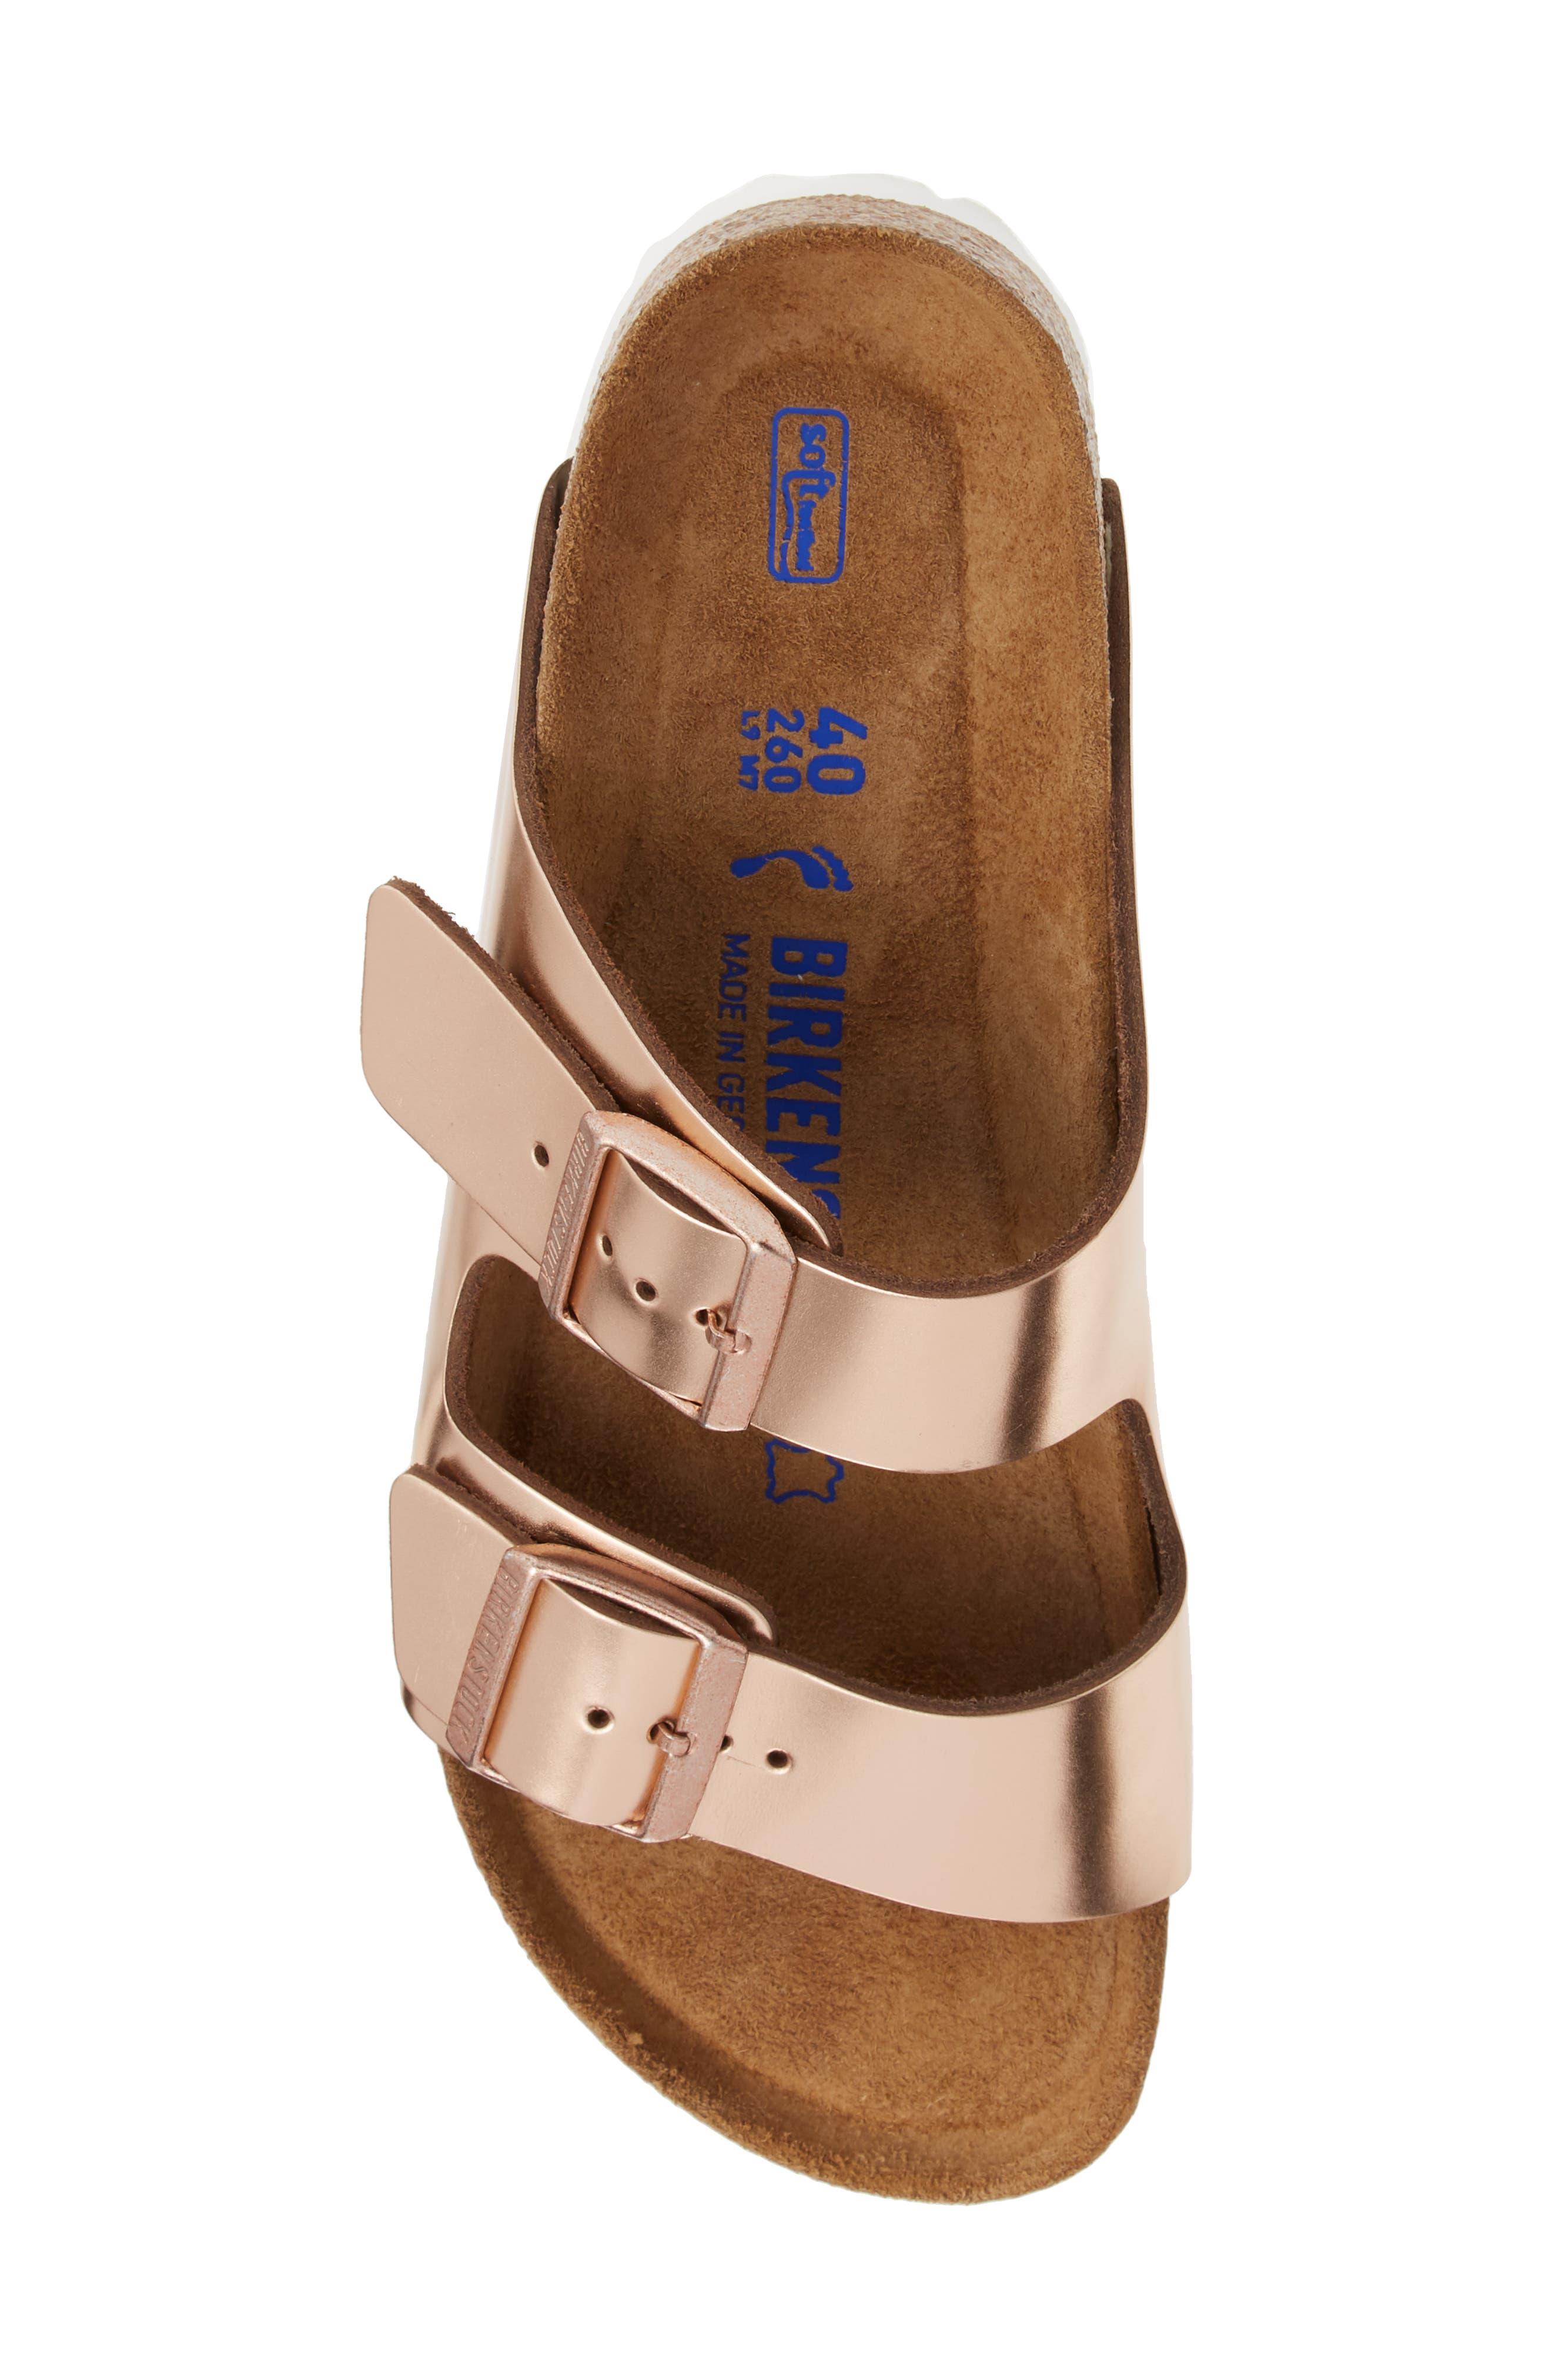 Arizona Soft Footbed Sandal,                             Alternate thumbnail 5, color,                             COPPER LEATHER